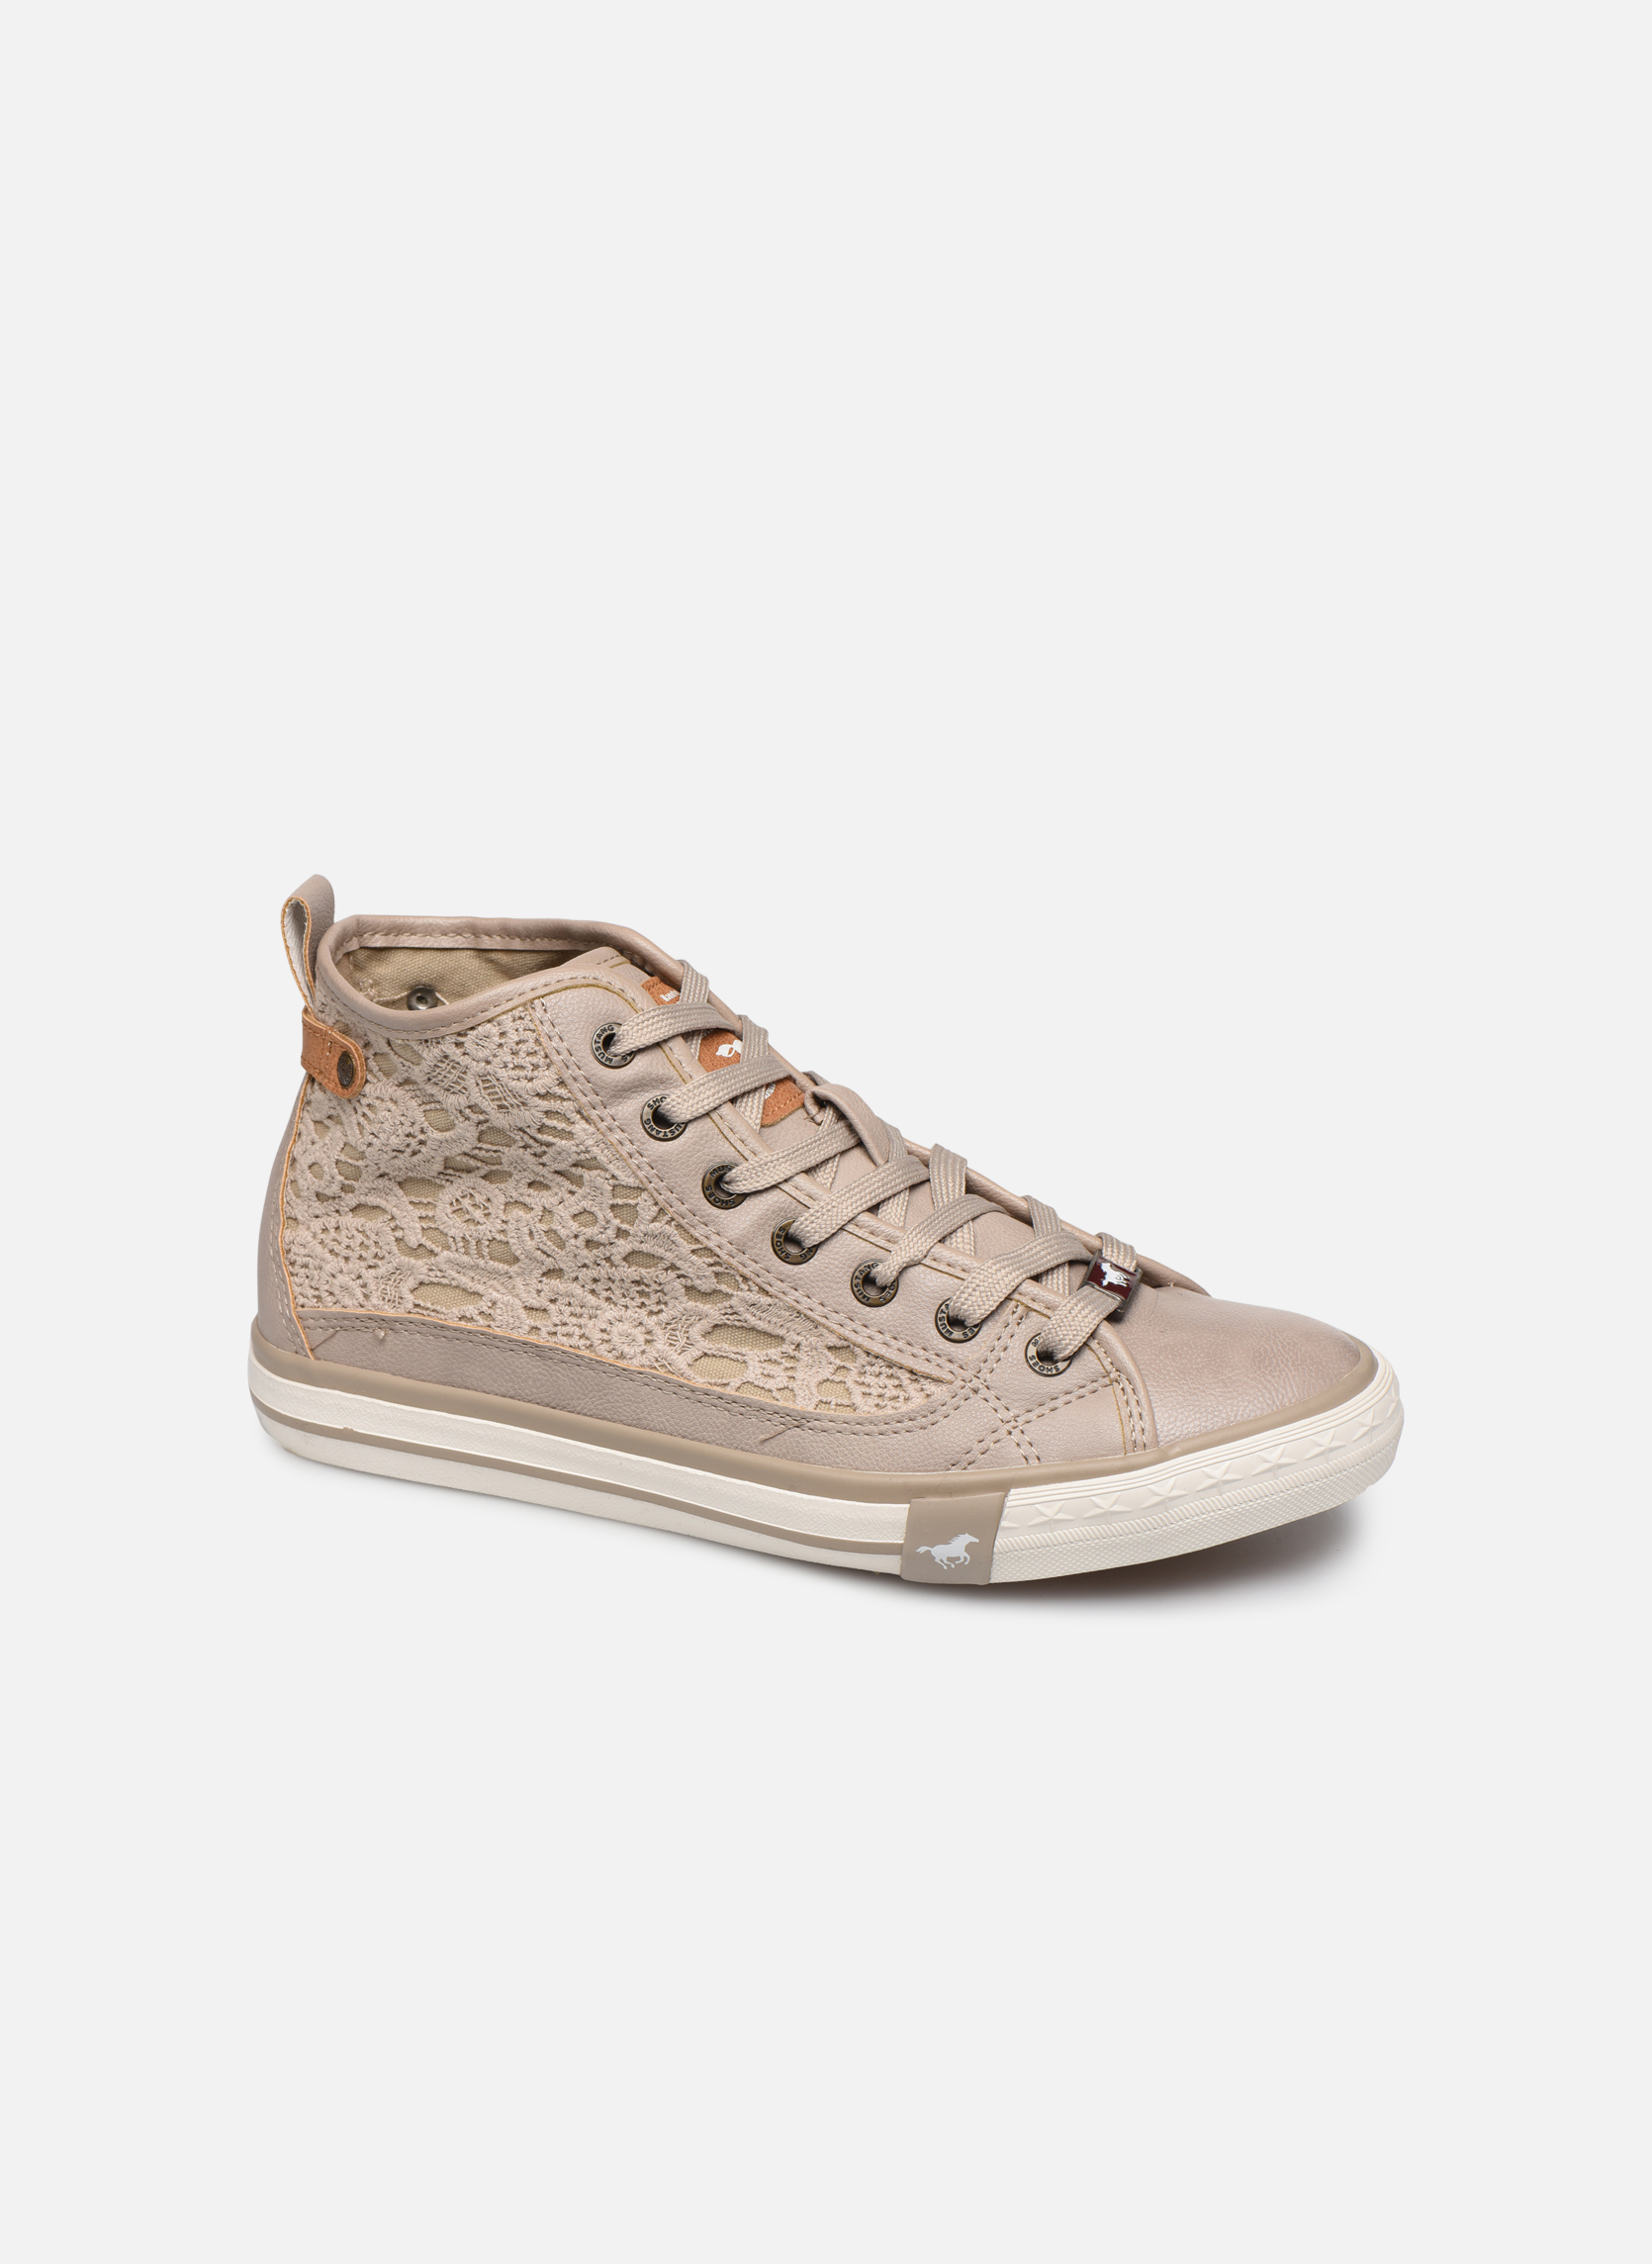 Sneakers Donna Nola